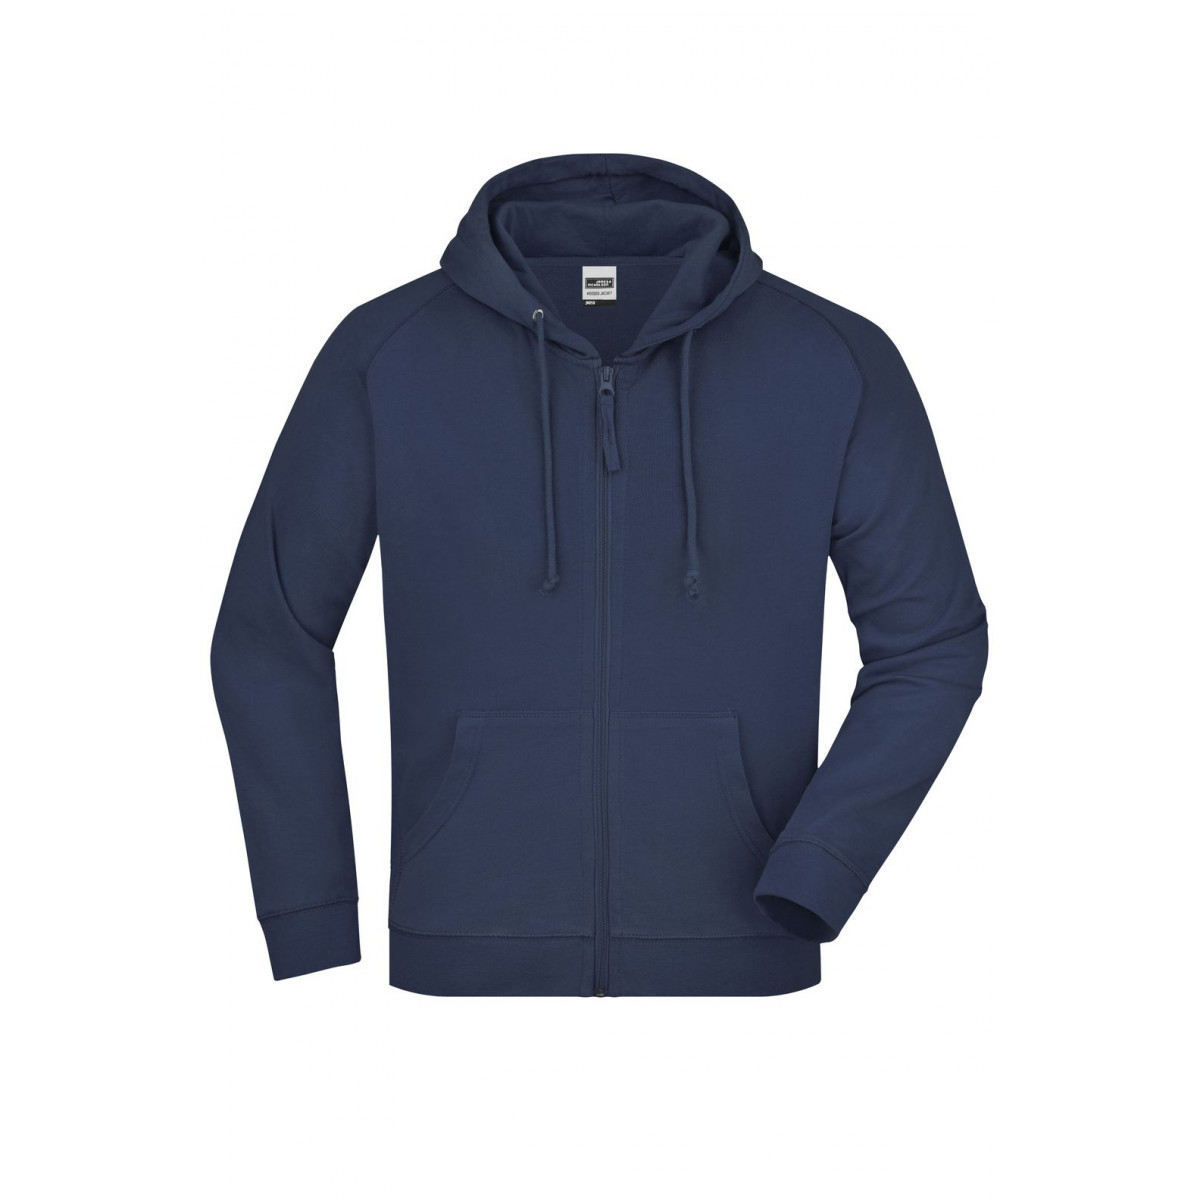 Толстовка мужская JN059 Hooded Jacket - Темно-синий